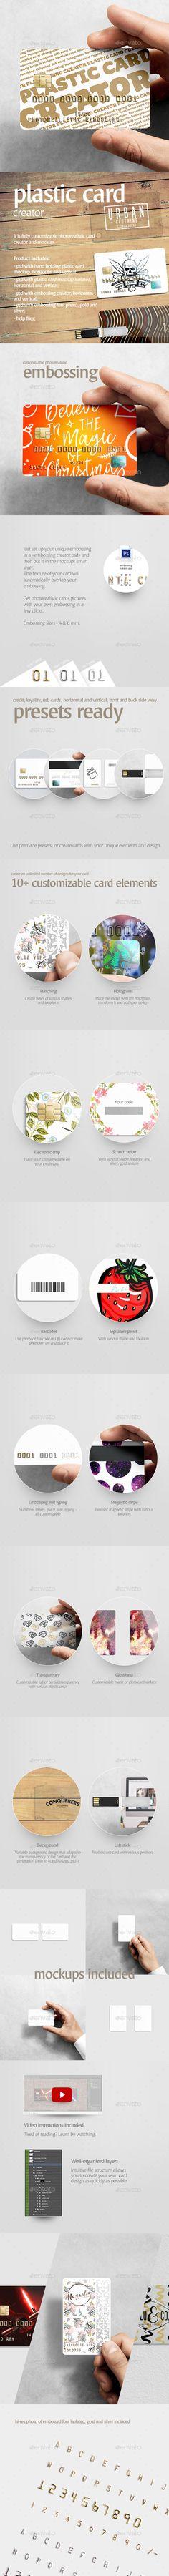 Plastic Card Creator - #Business #Cards Print Download here: https://graphicriver.net/item/plastic-card-creator/19721767?ref=alena994